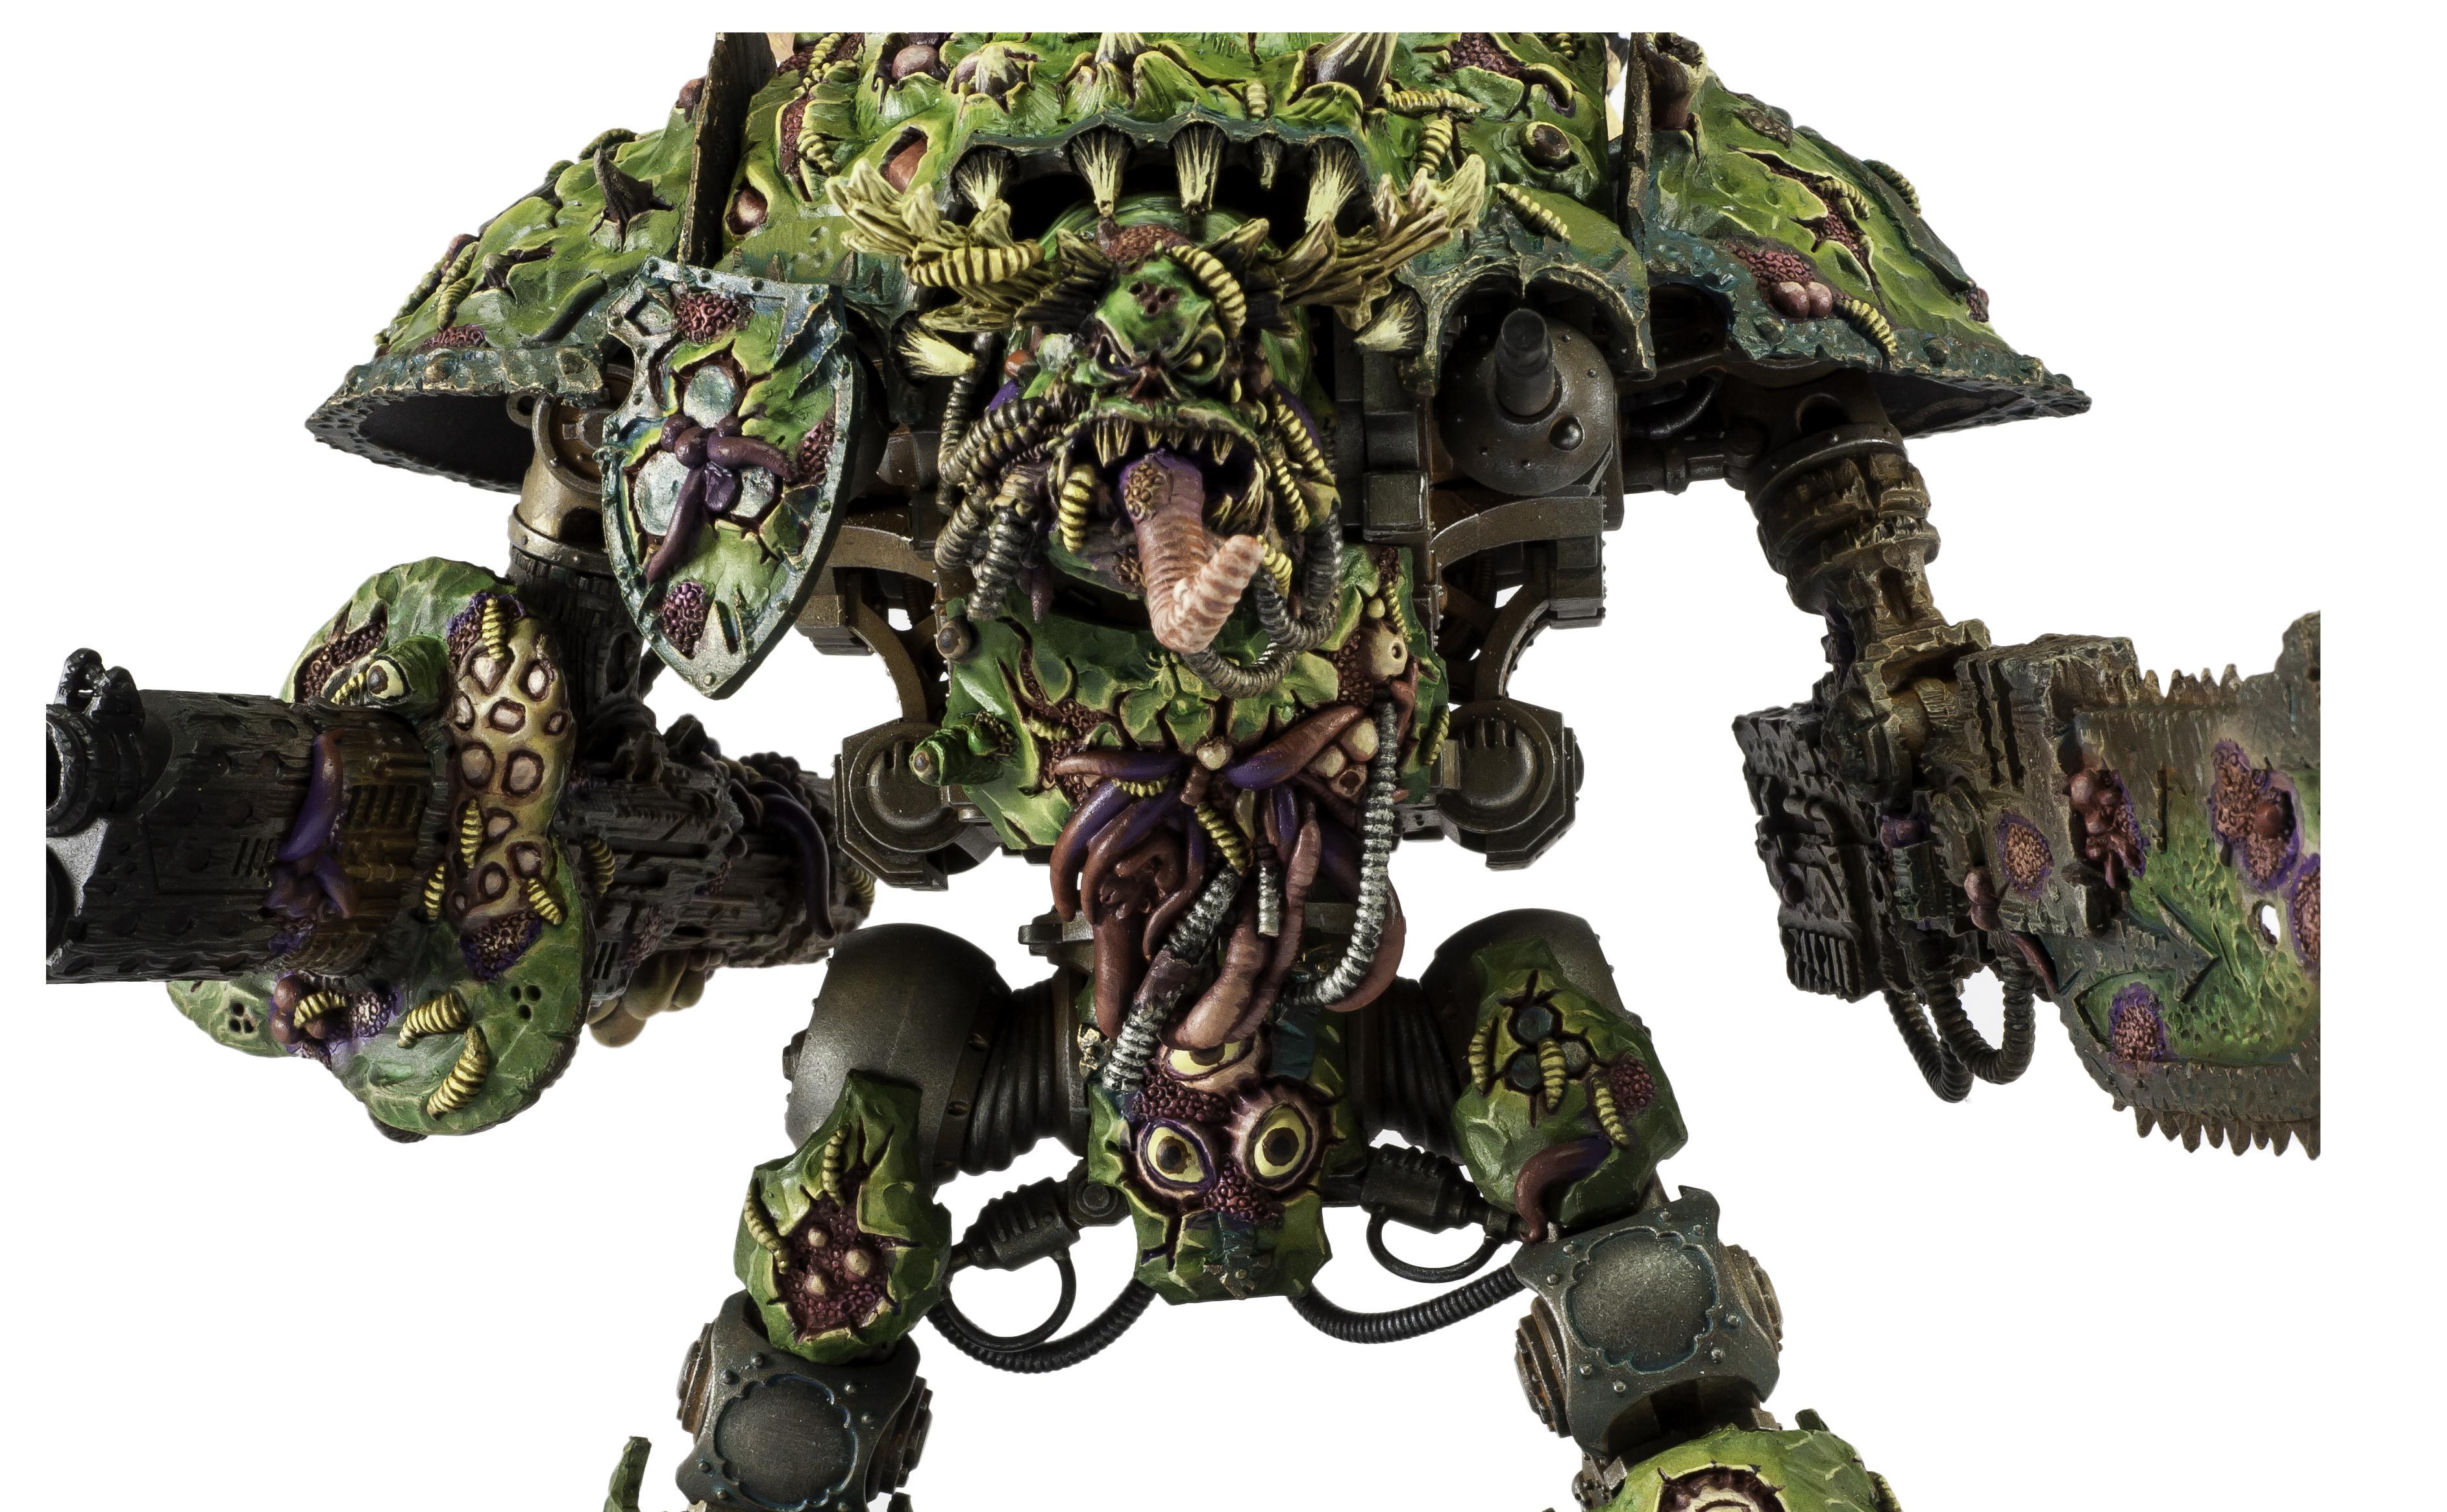 Chaos Daemons, Chaos Space Marines, Greenstuff, Knights, Nurgle, Warhammer 40,000